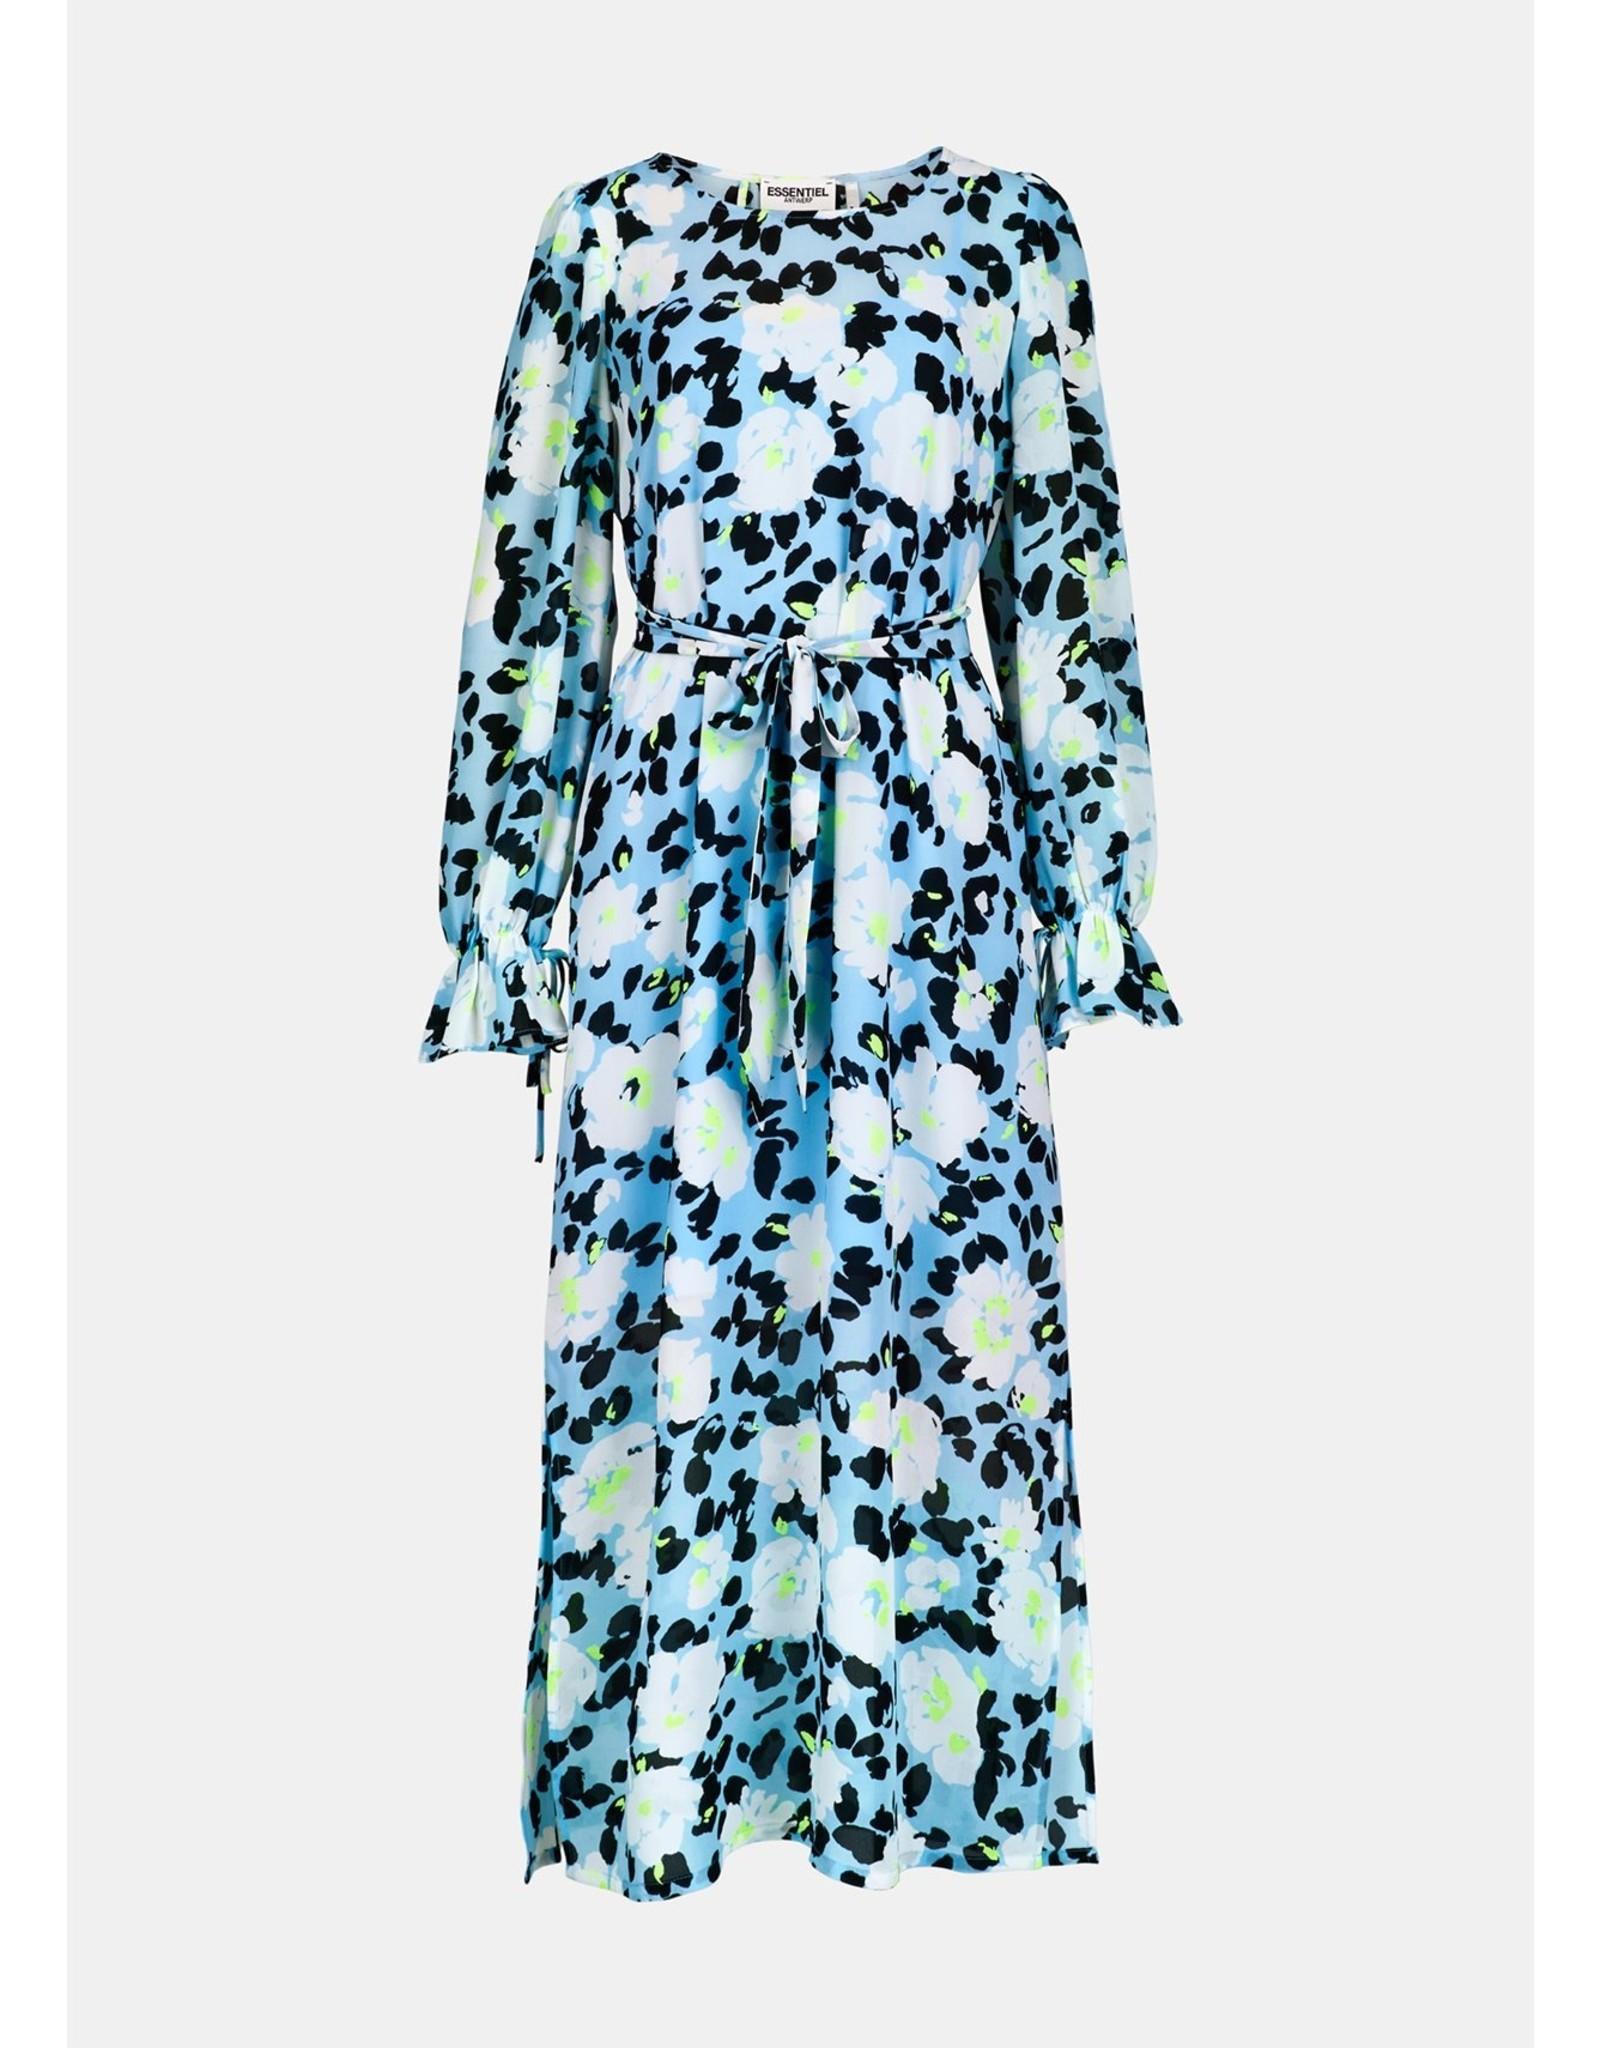 Essentiel Vekken Floral Dress